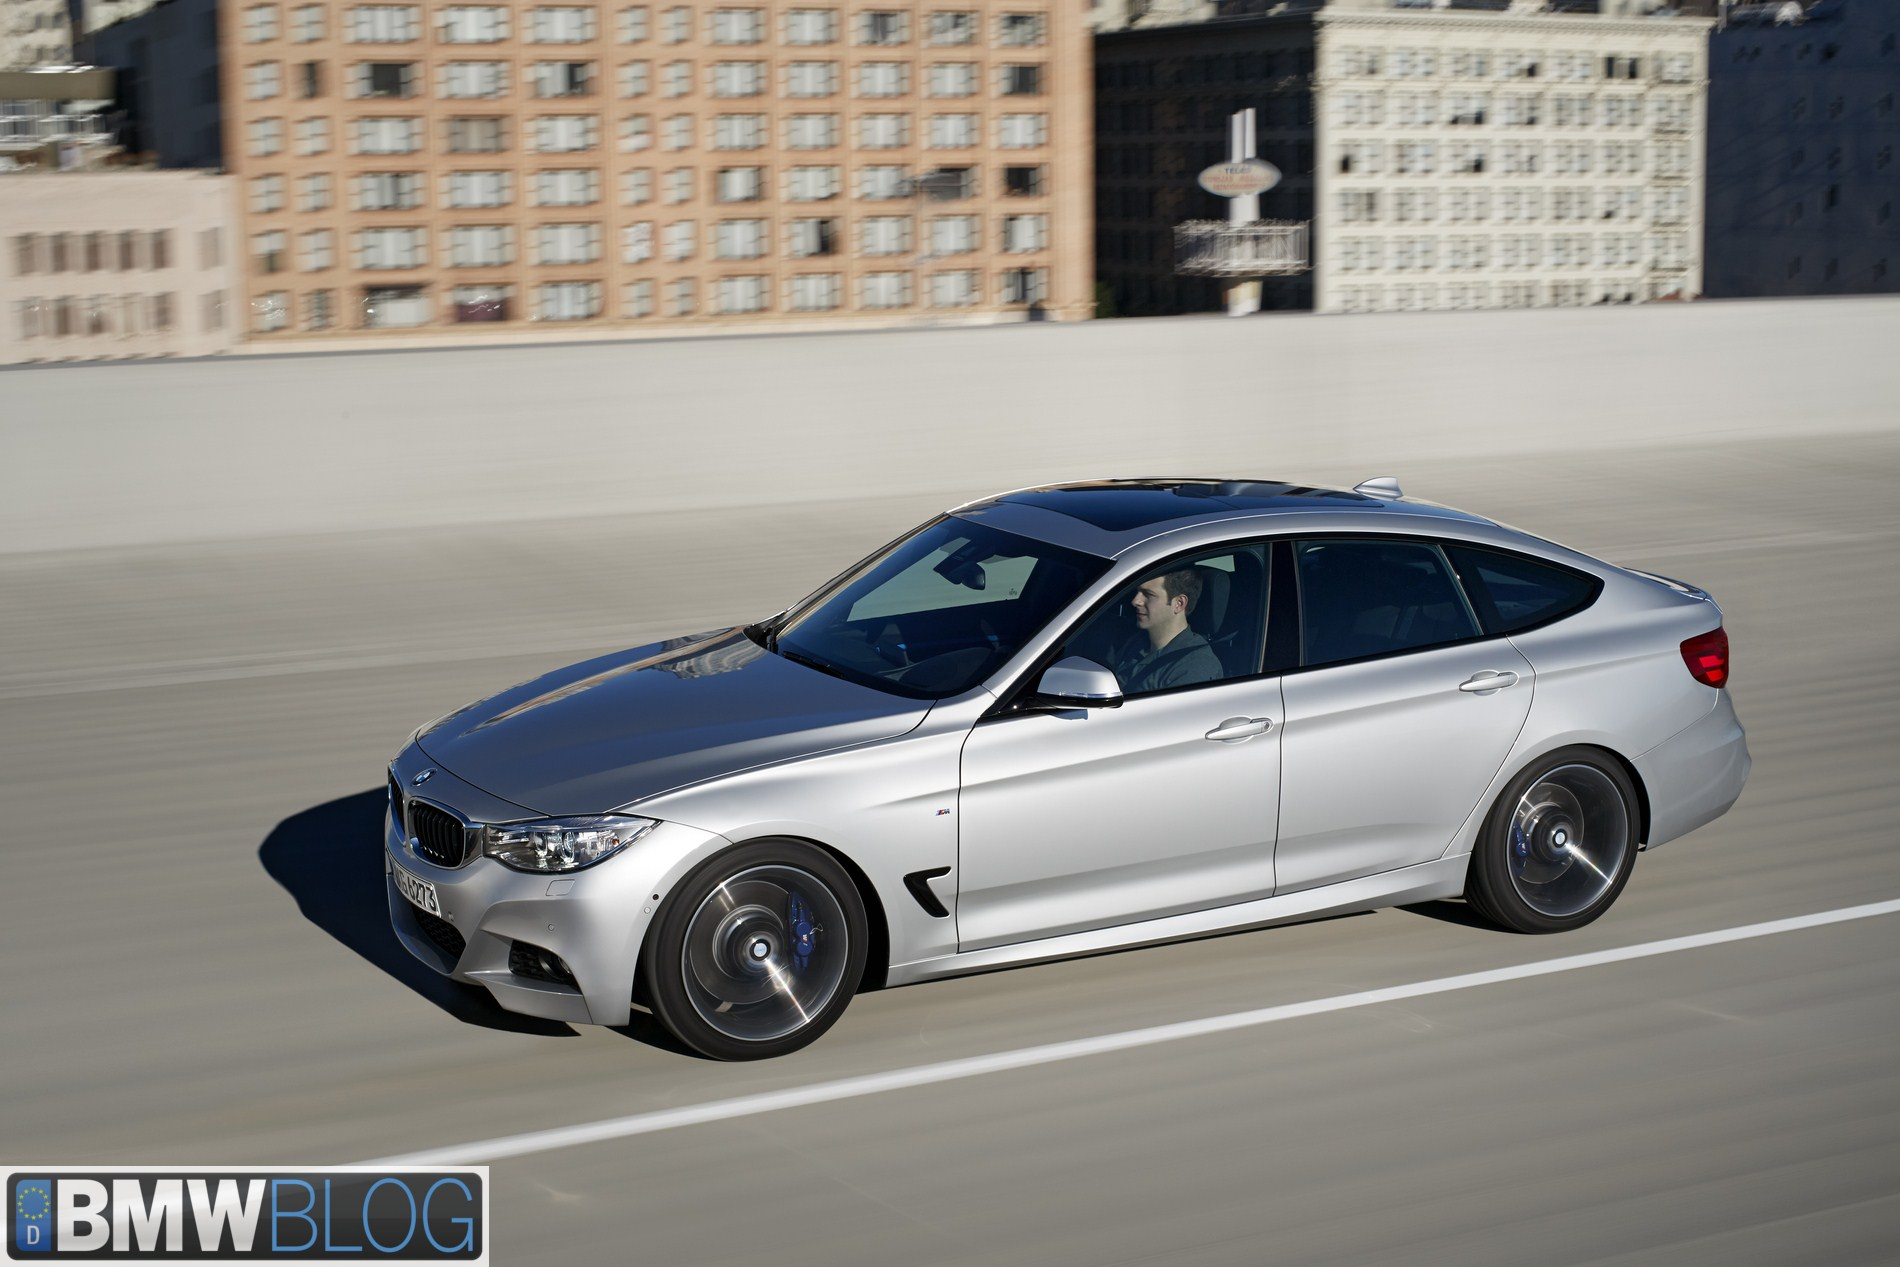 BMW 328I Gt >> 2013 Bmw 328i Gt Bmwblog Test Drive